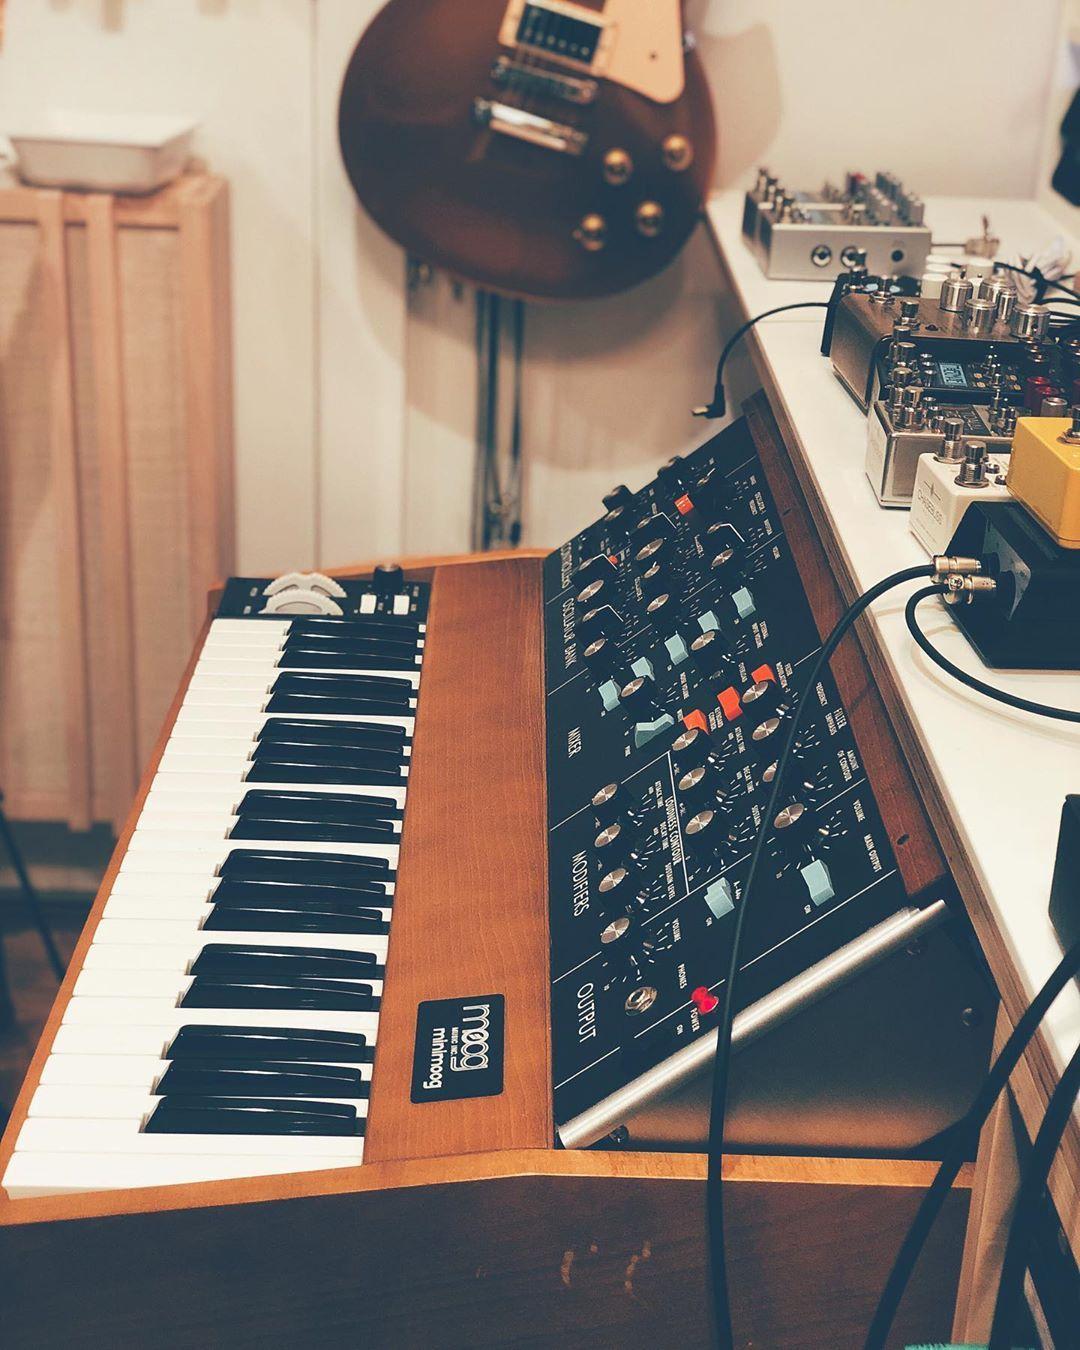 Pin by Brent Collins on Studio Inspo in 2020 Studio gear